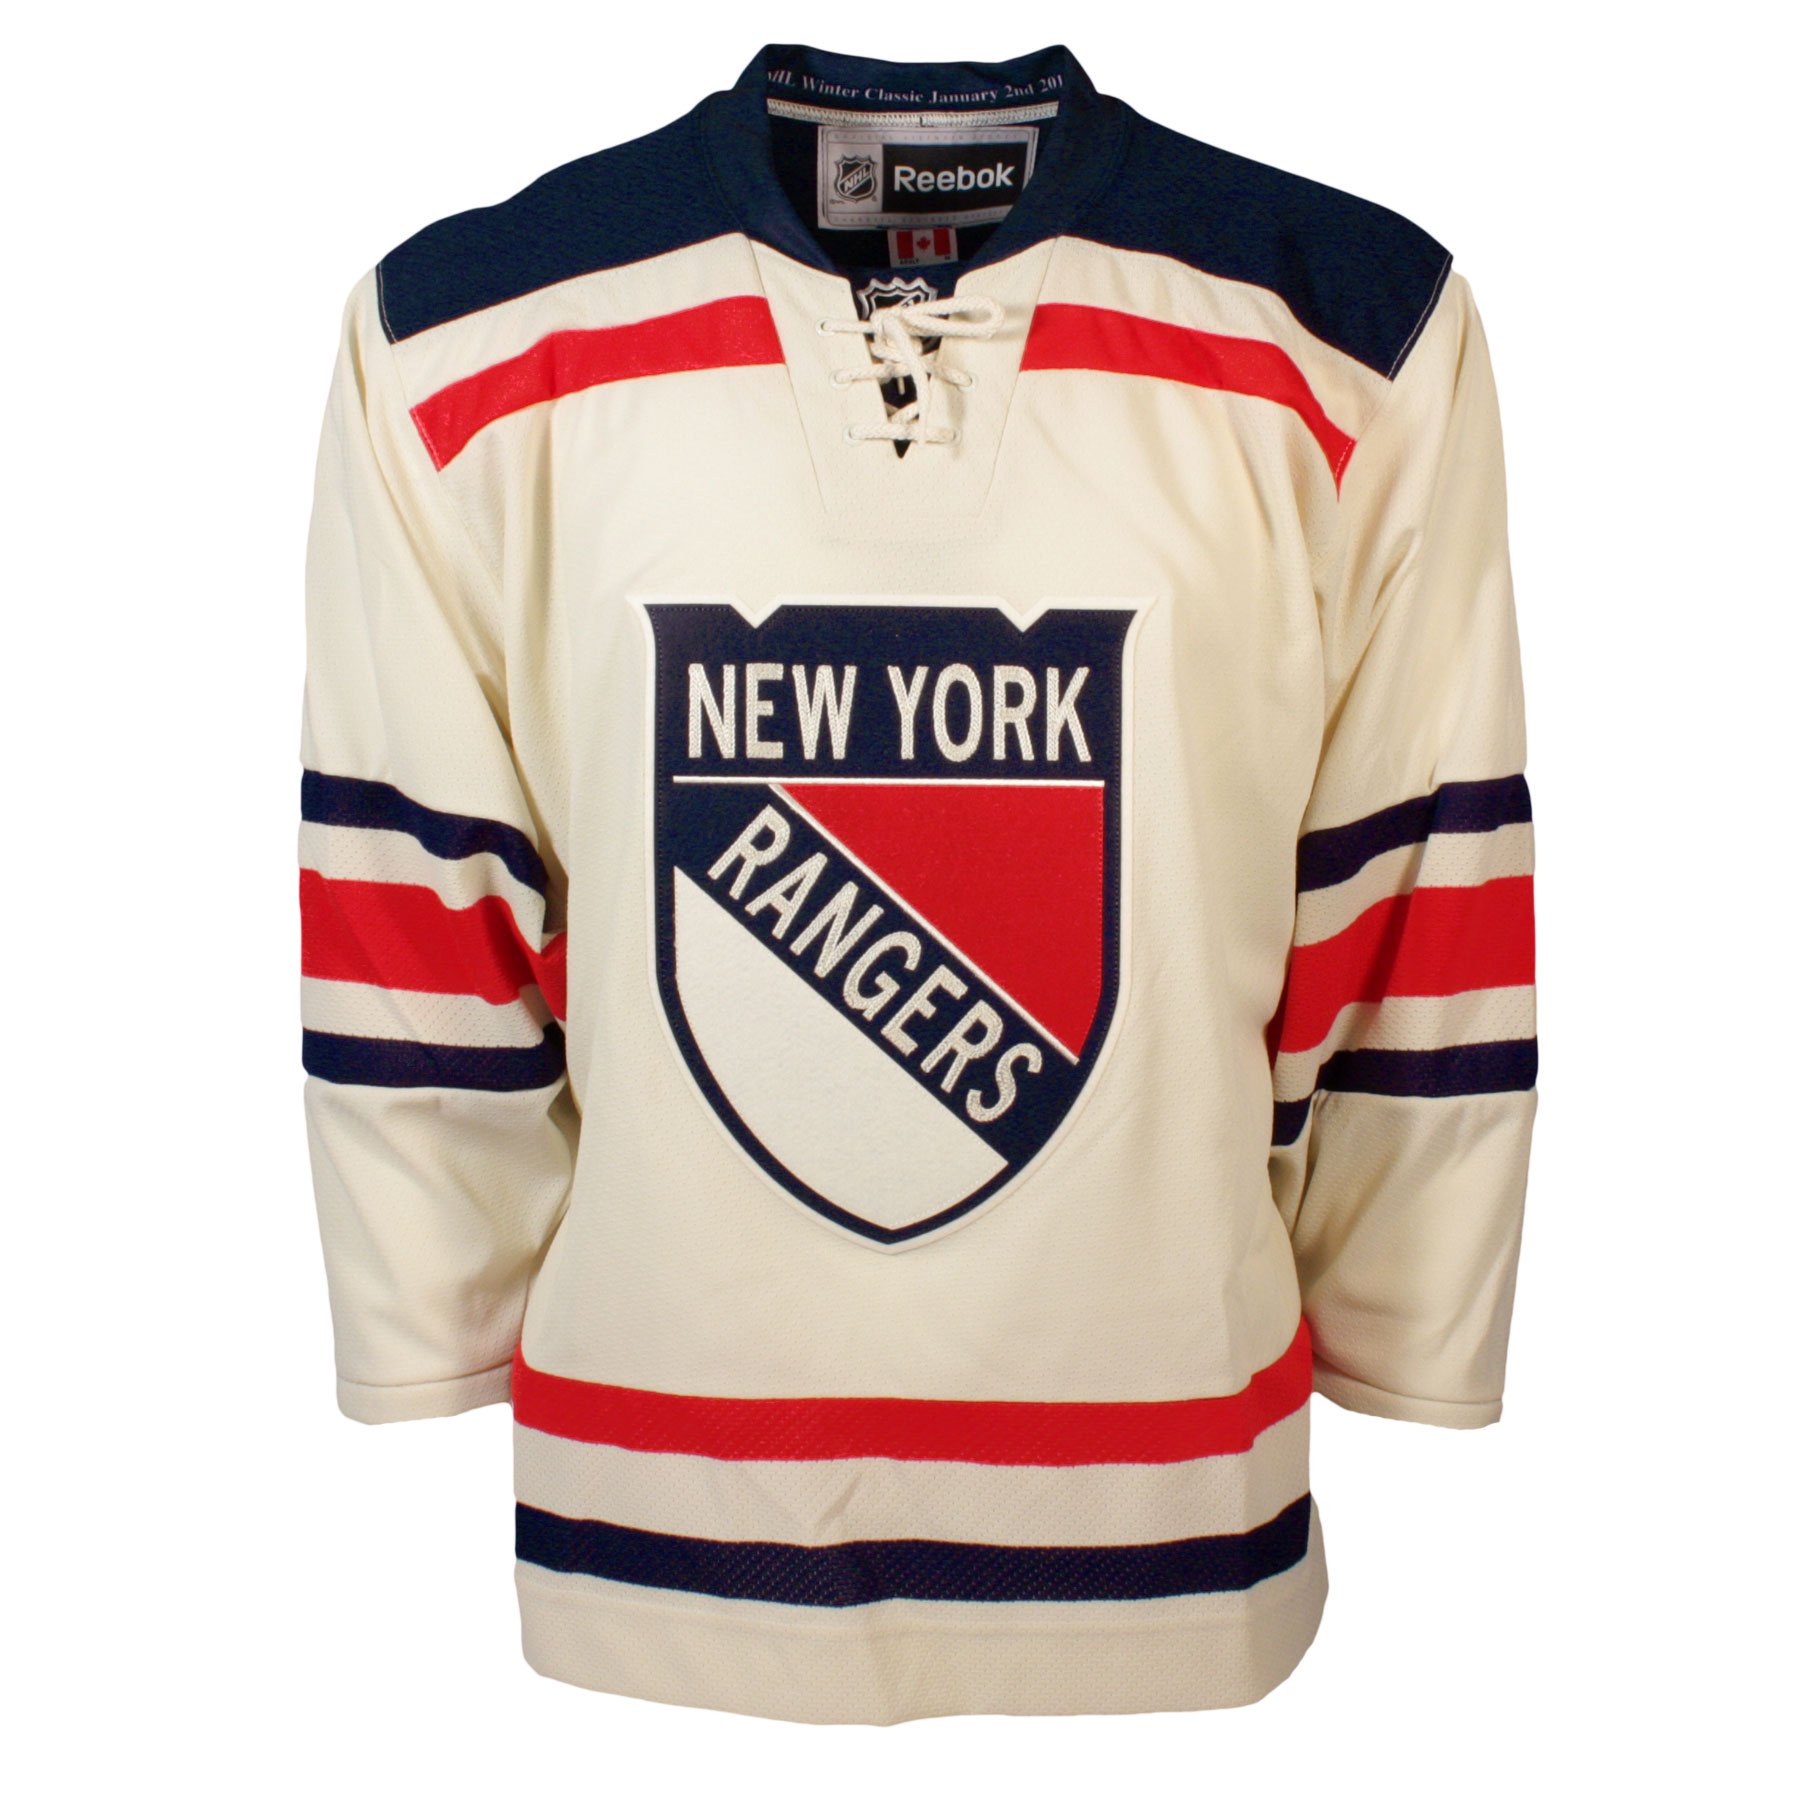 new style fb321 98d41 New York Rangers 2012 NHL Winter Classic Premier Replica ...